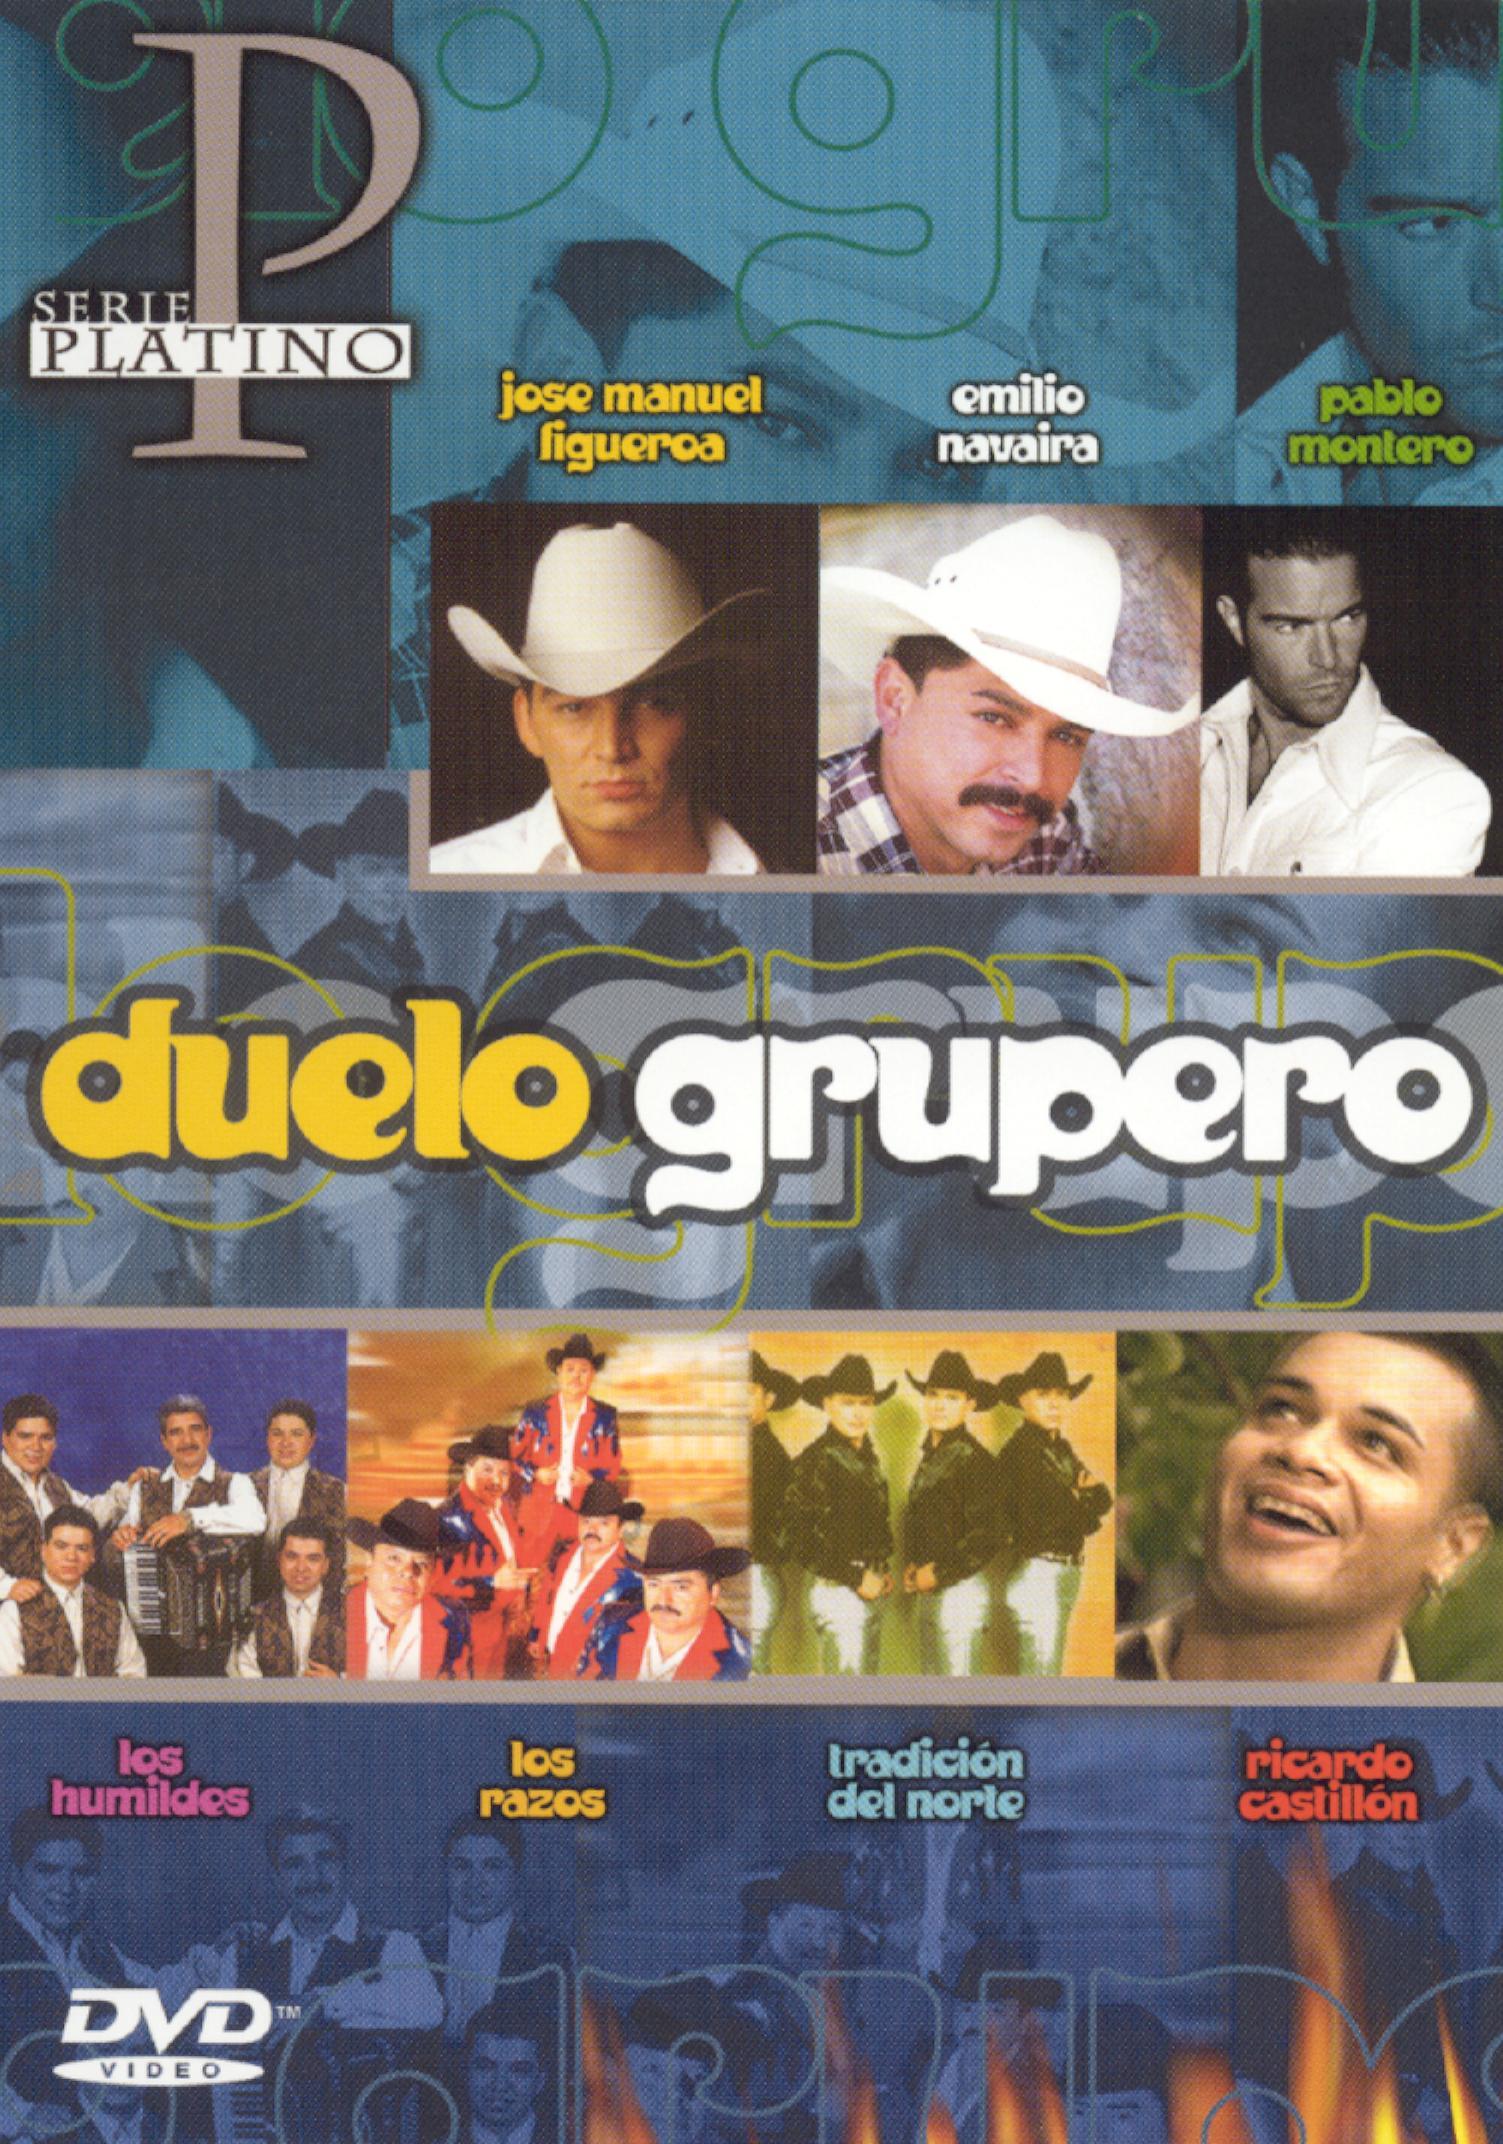 Duelo Grupero: Serie Platino